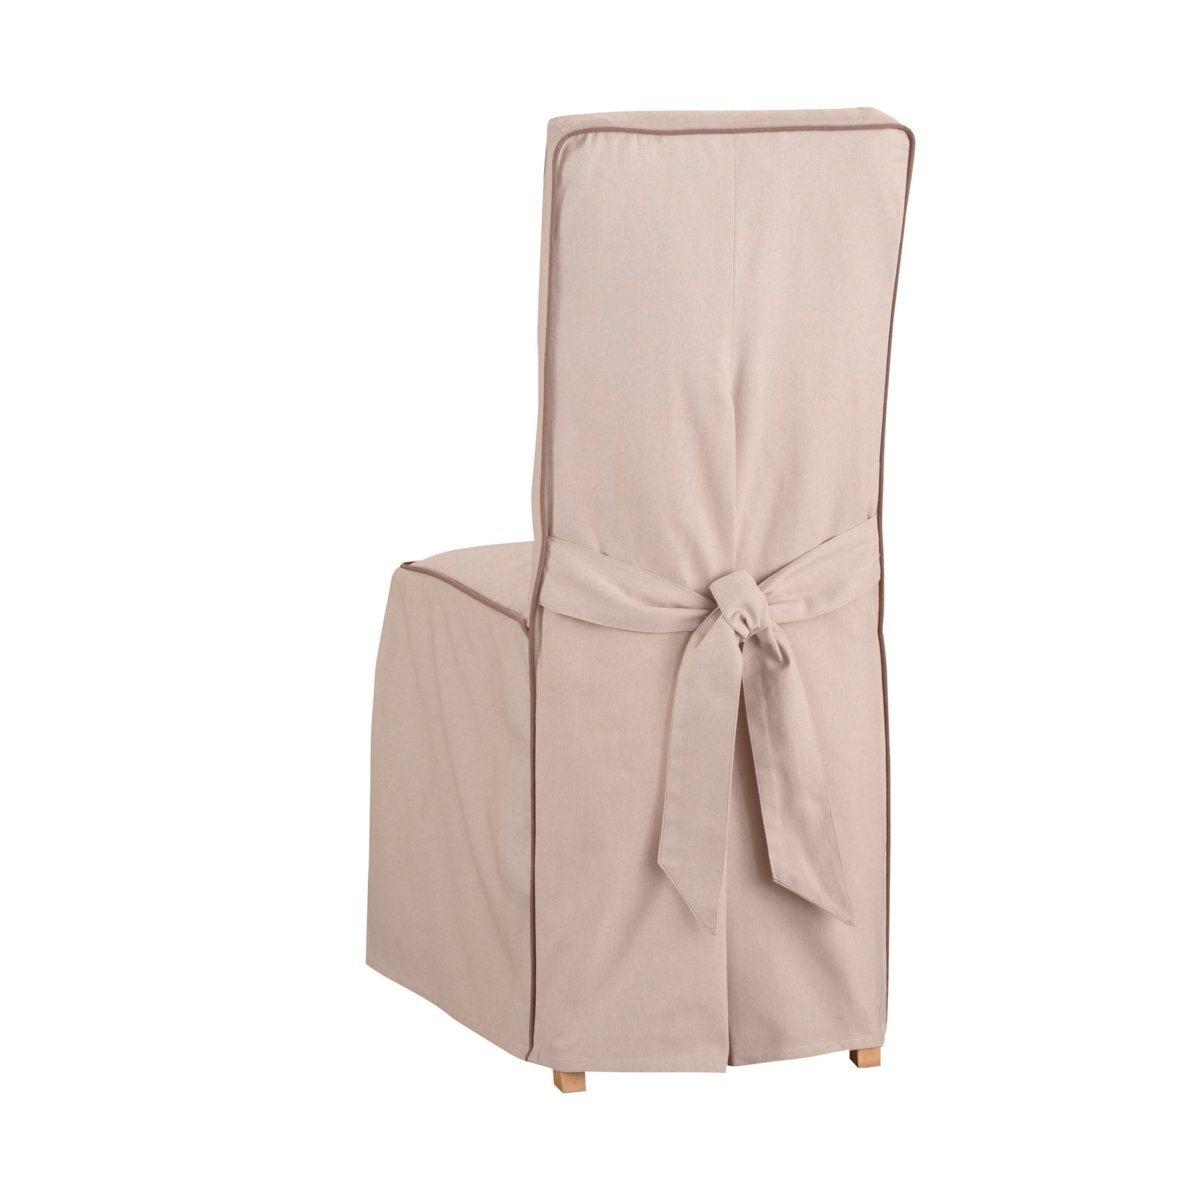 Чехол для стула, BRIDGY.